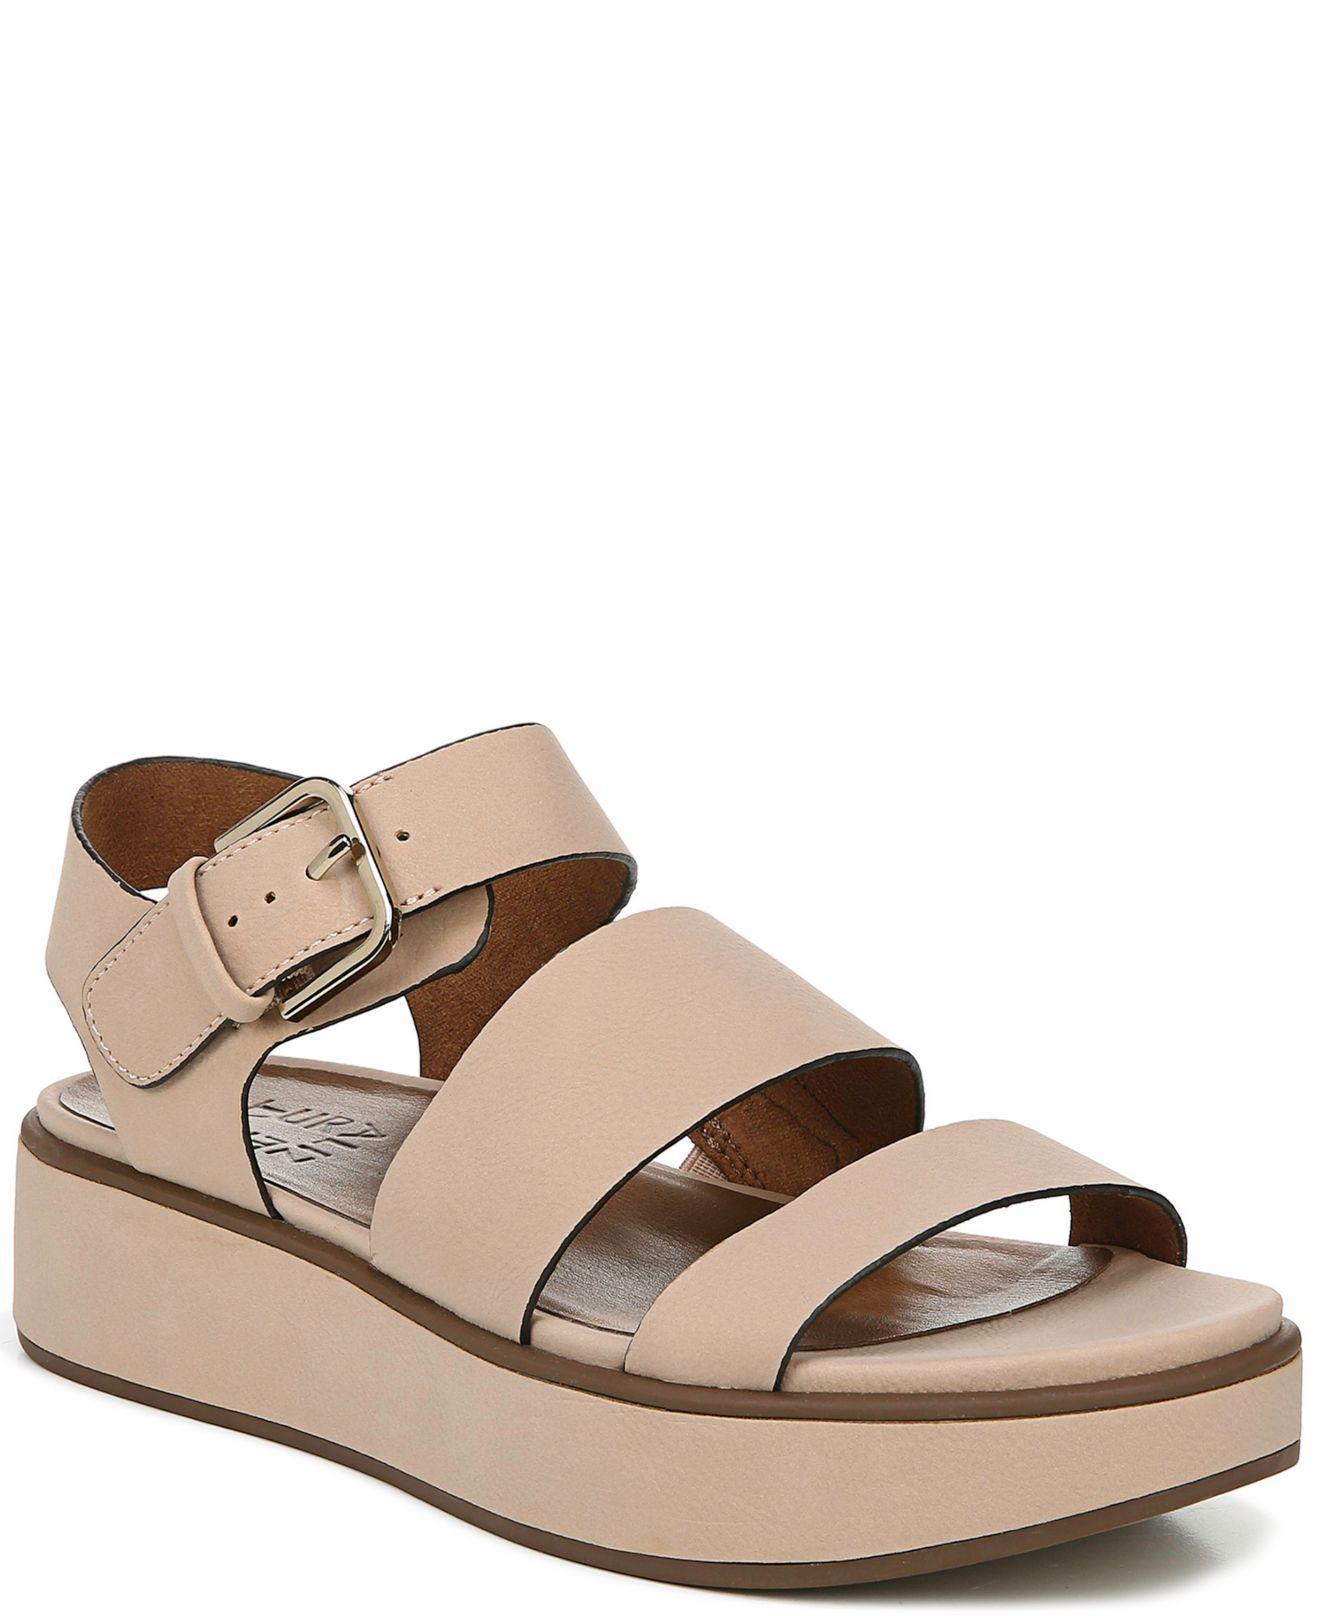 92a55f126146 Naturalizer. Women s Brooke Sandals